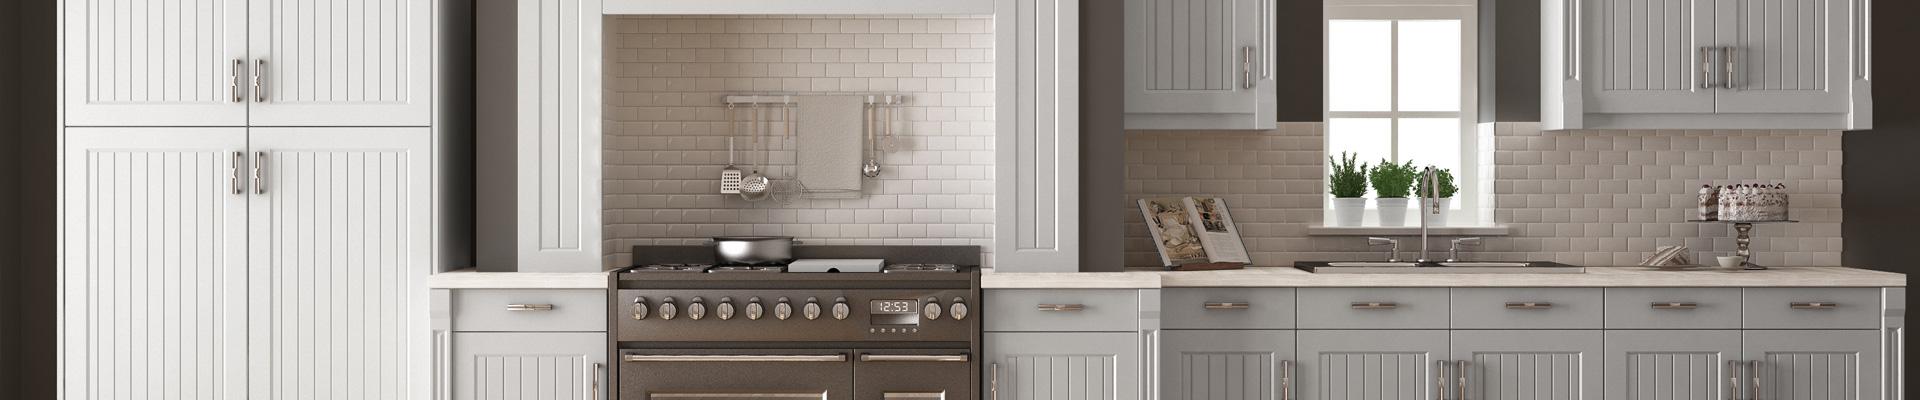 Class white, minimalist kitchen cabinets